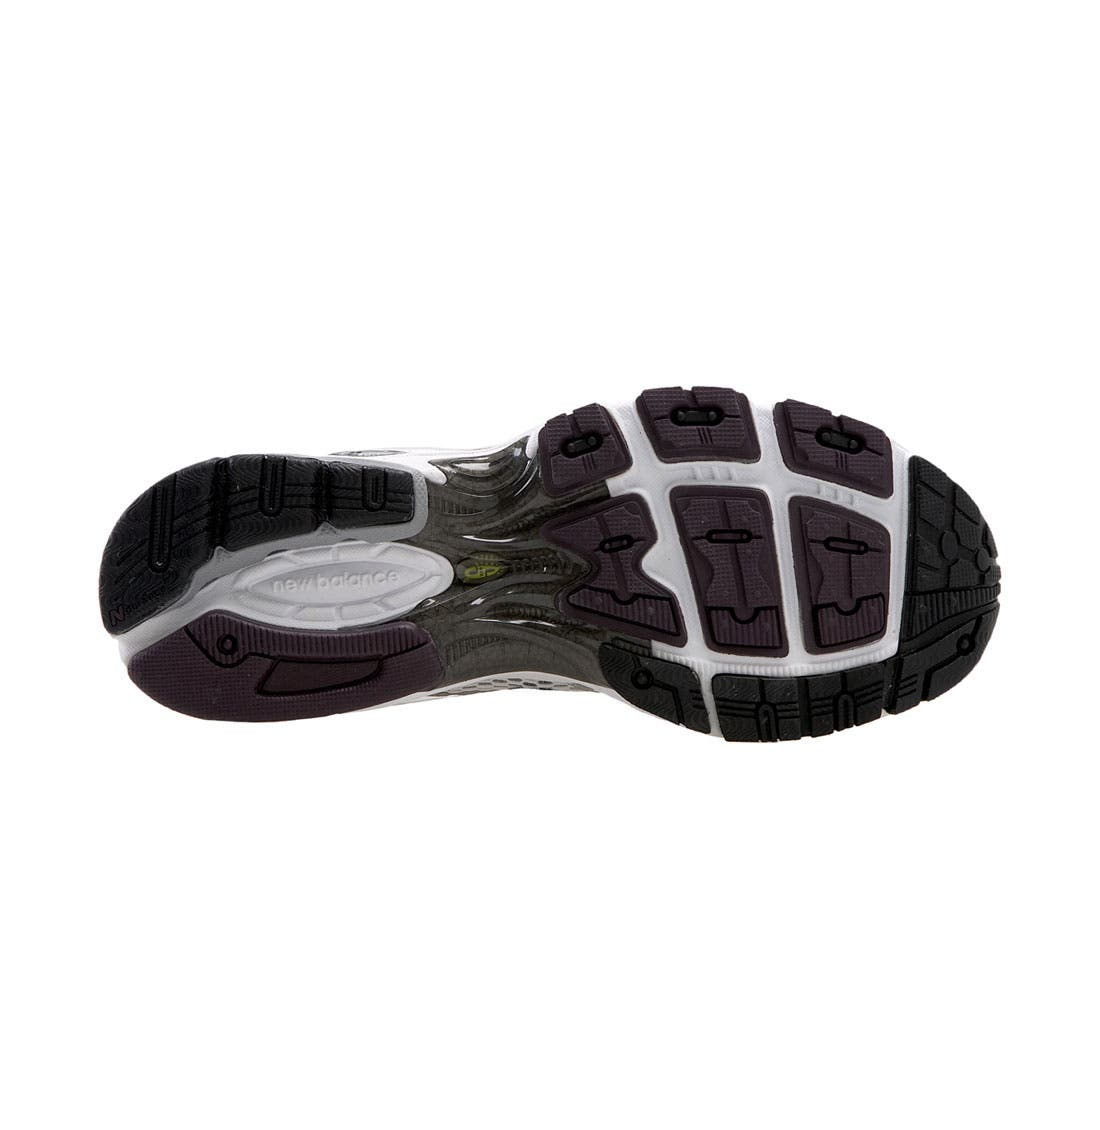 Alternate Image 4  - New Balance '759' Running Shoe (Women)(Retail Price: $77.95)